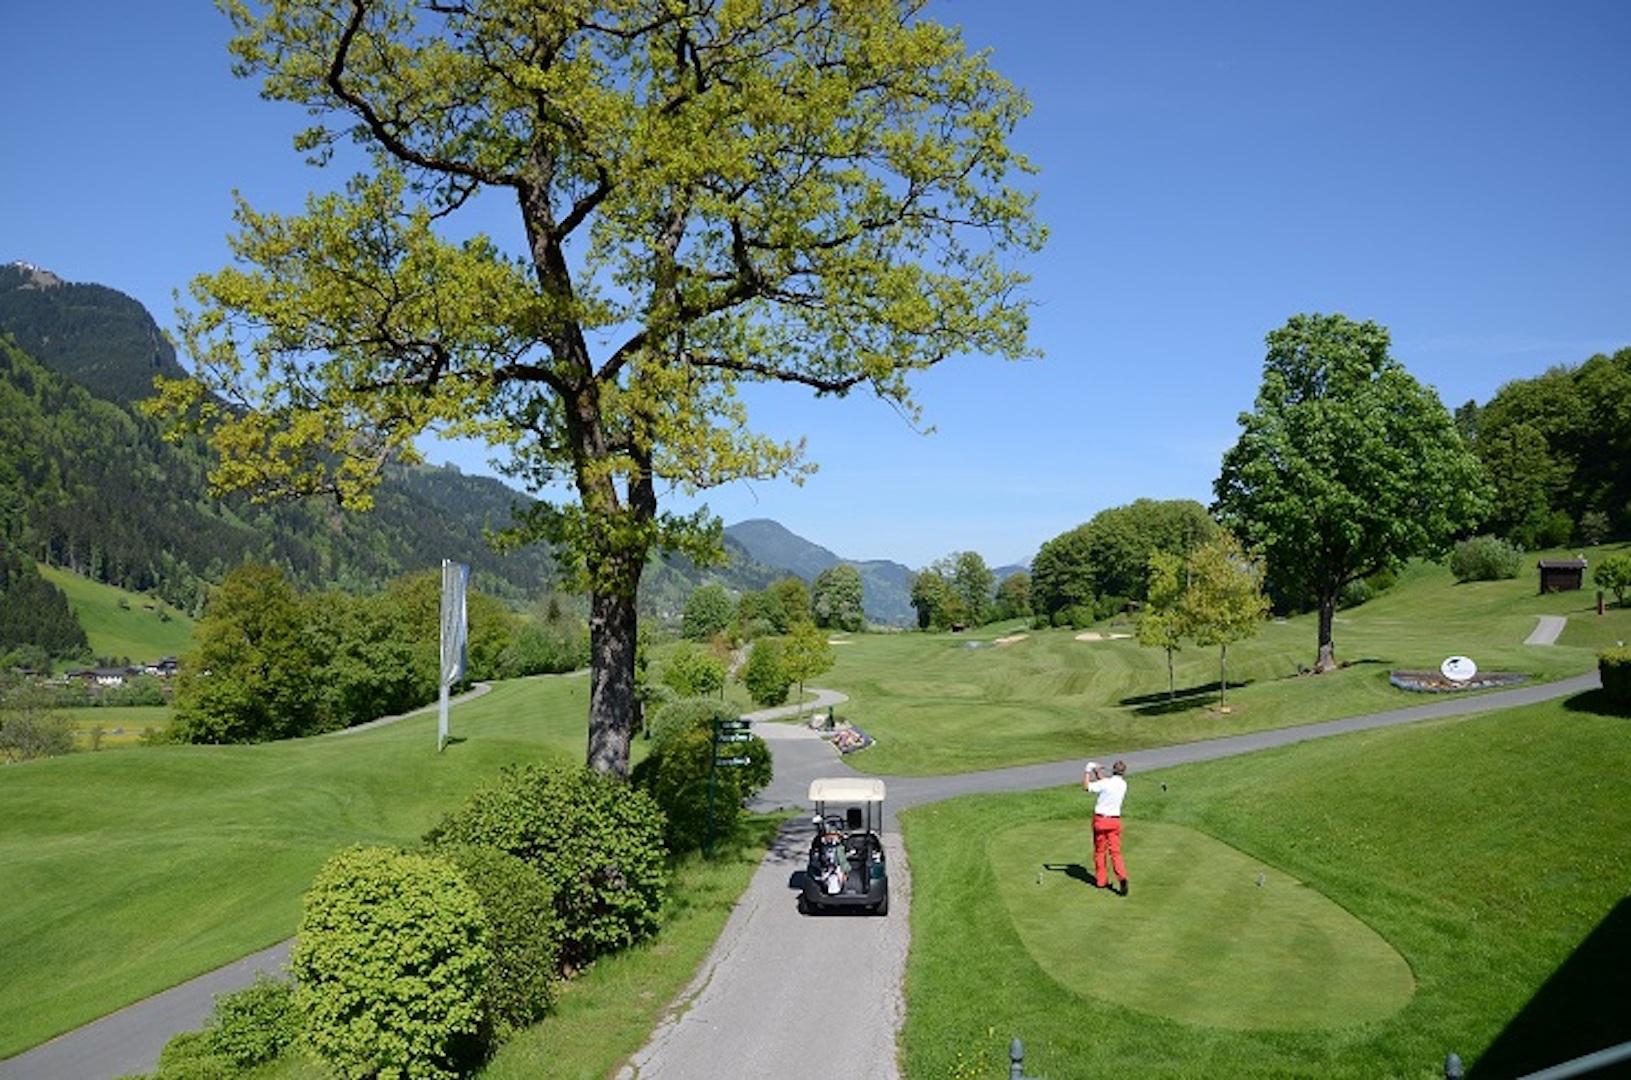 Eichenheim Golf Club is hitting new heights